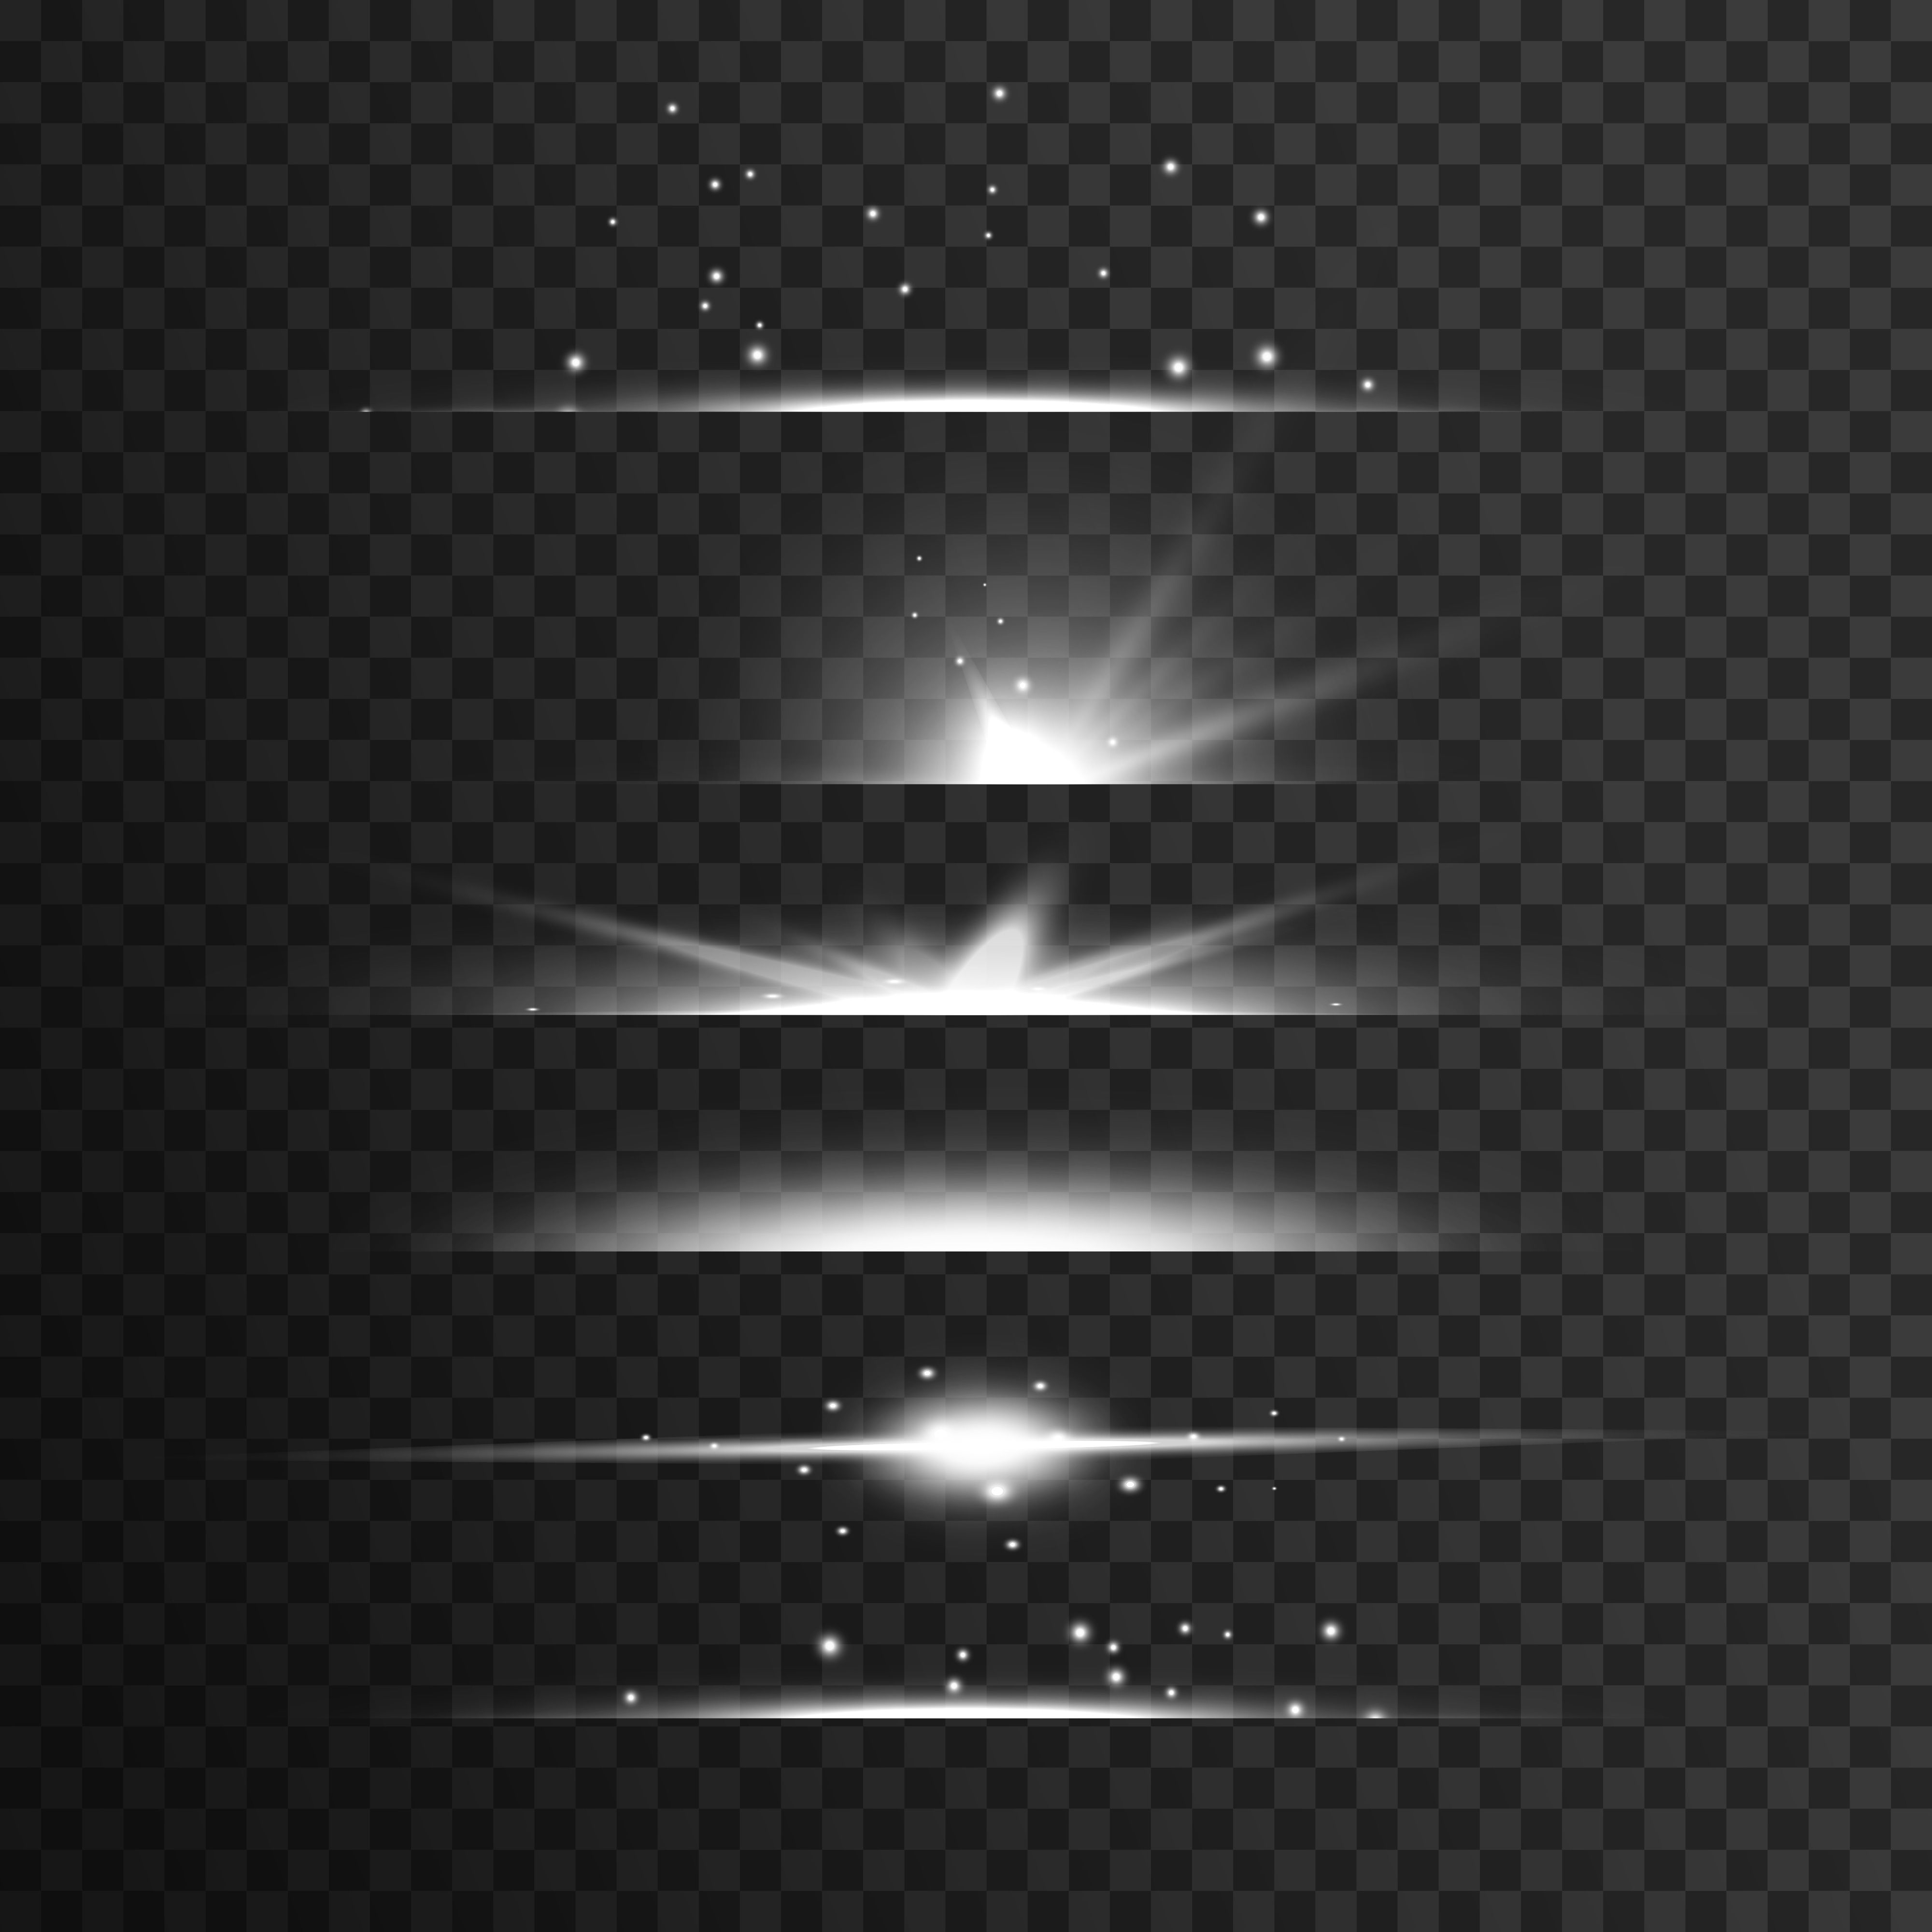 Transparent White Light Streak Effect Vector Background Choose From Thousands Of Free Vectors Clip Art Designs Icons Vector Art Design Clip Art Vector Free